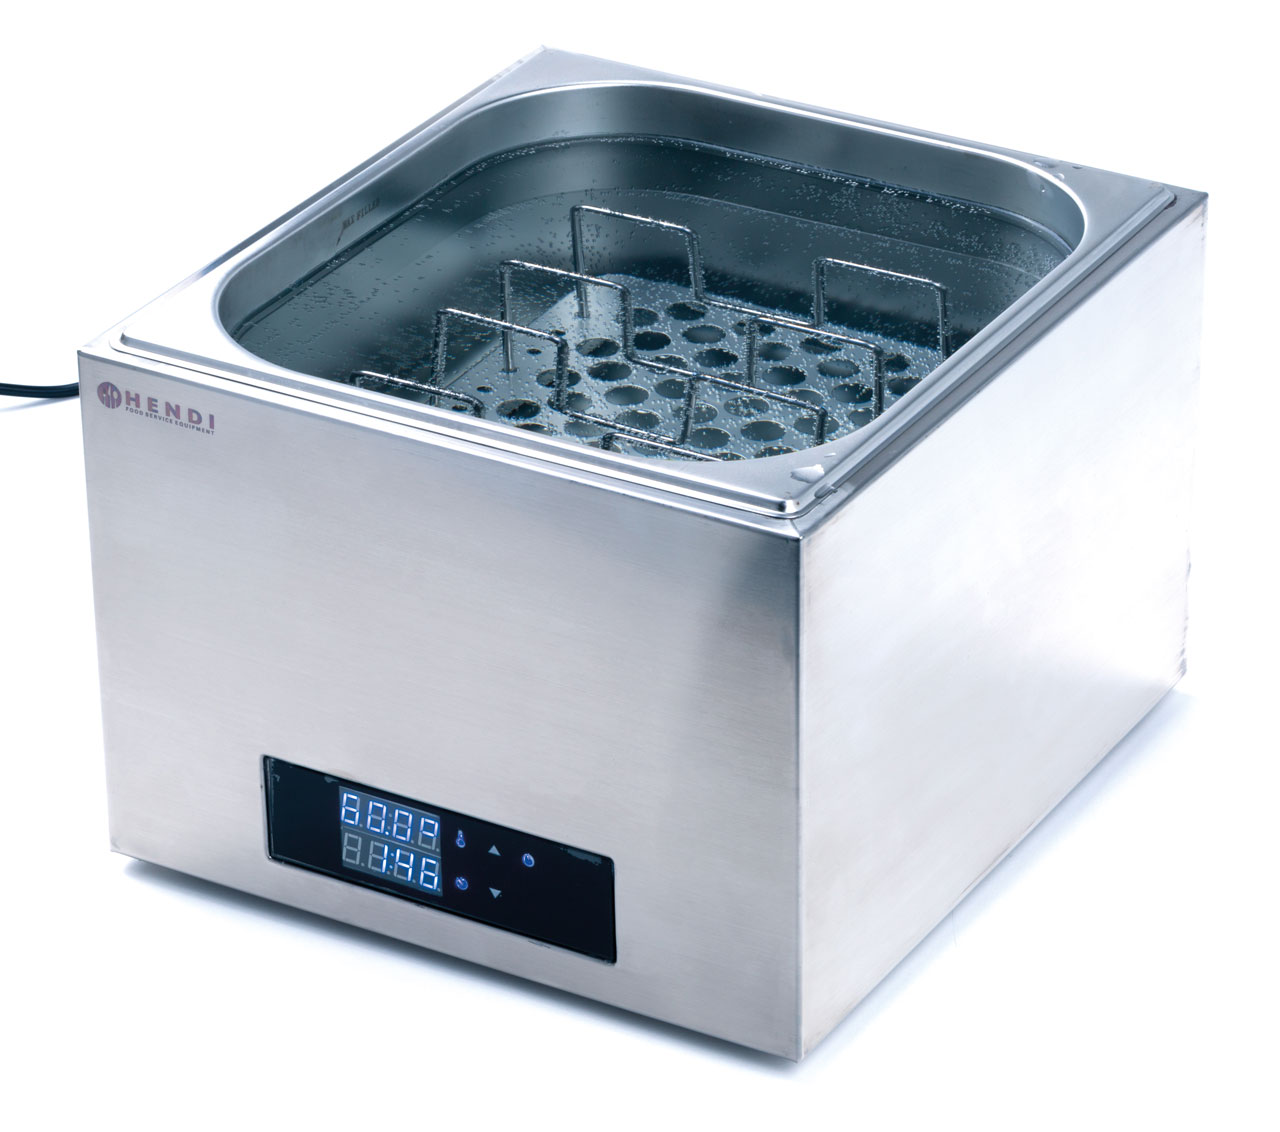 Hendi sous-vide machine GN2/3 (13 liter)